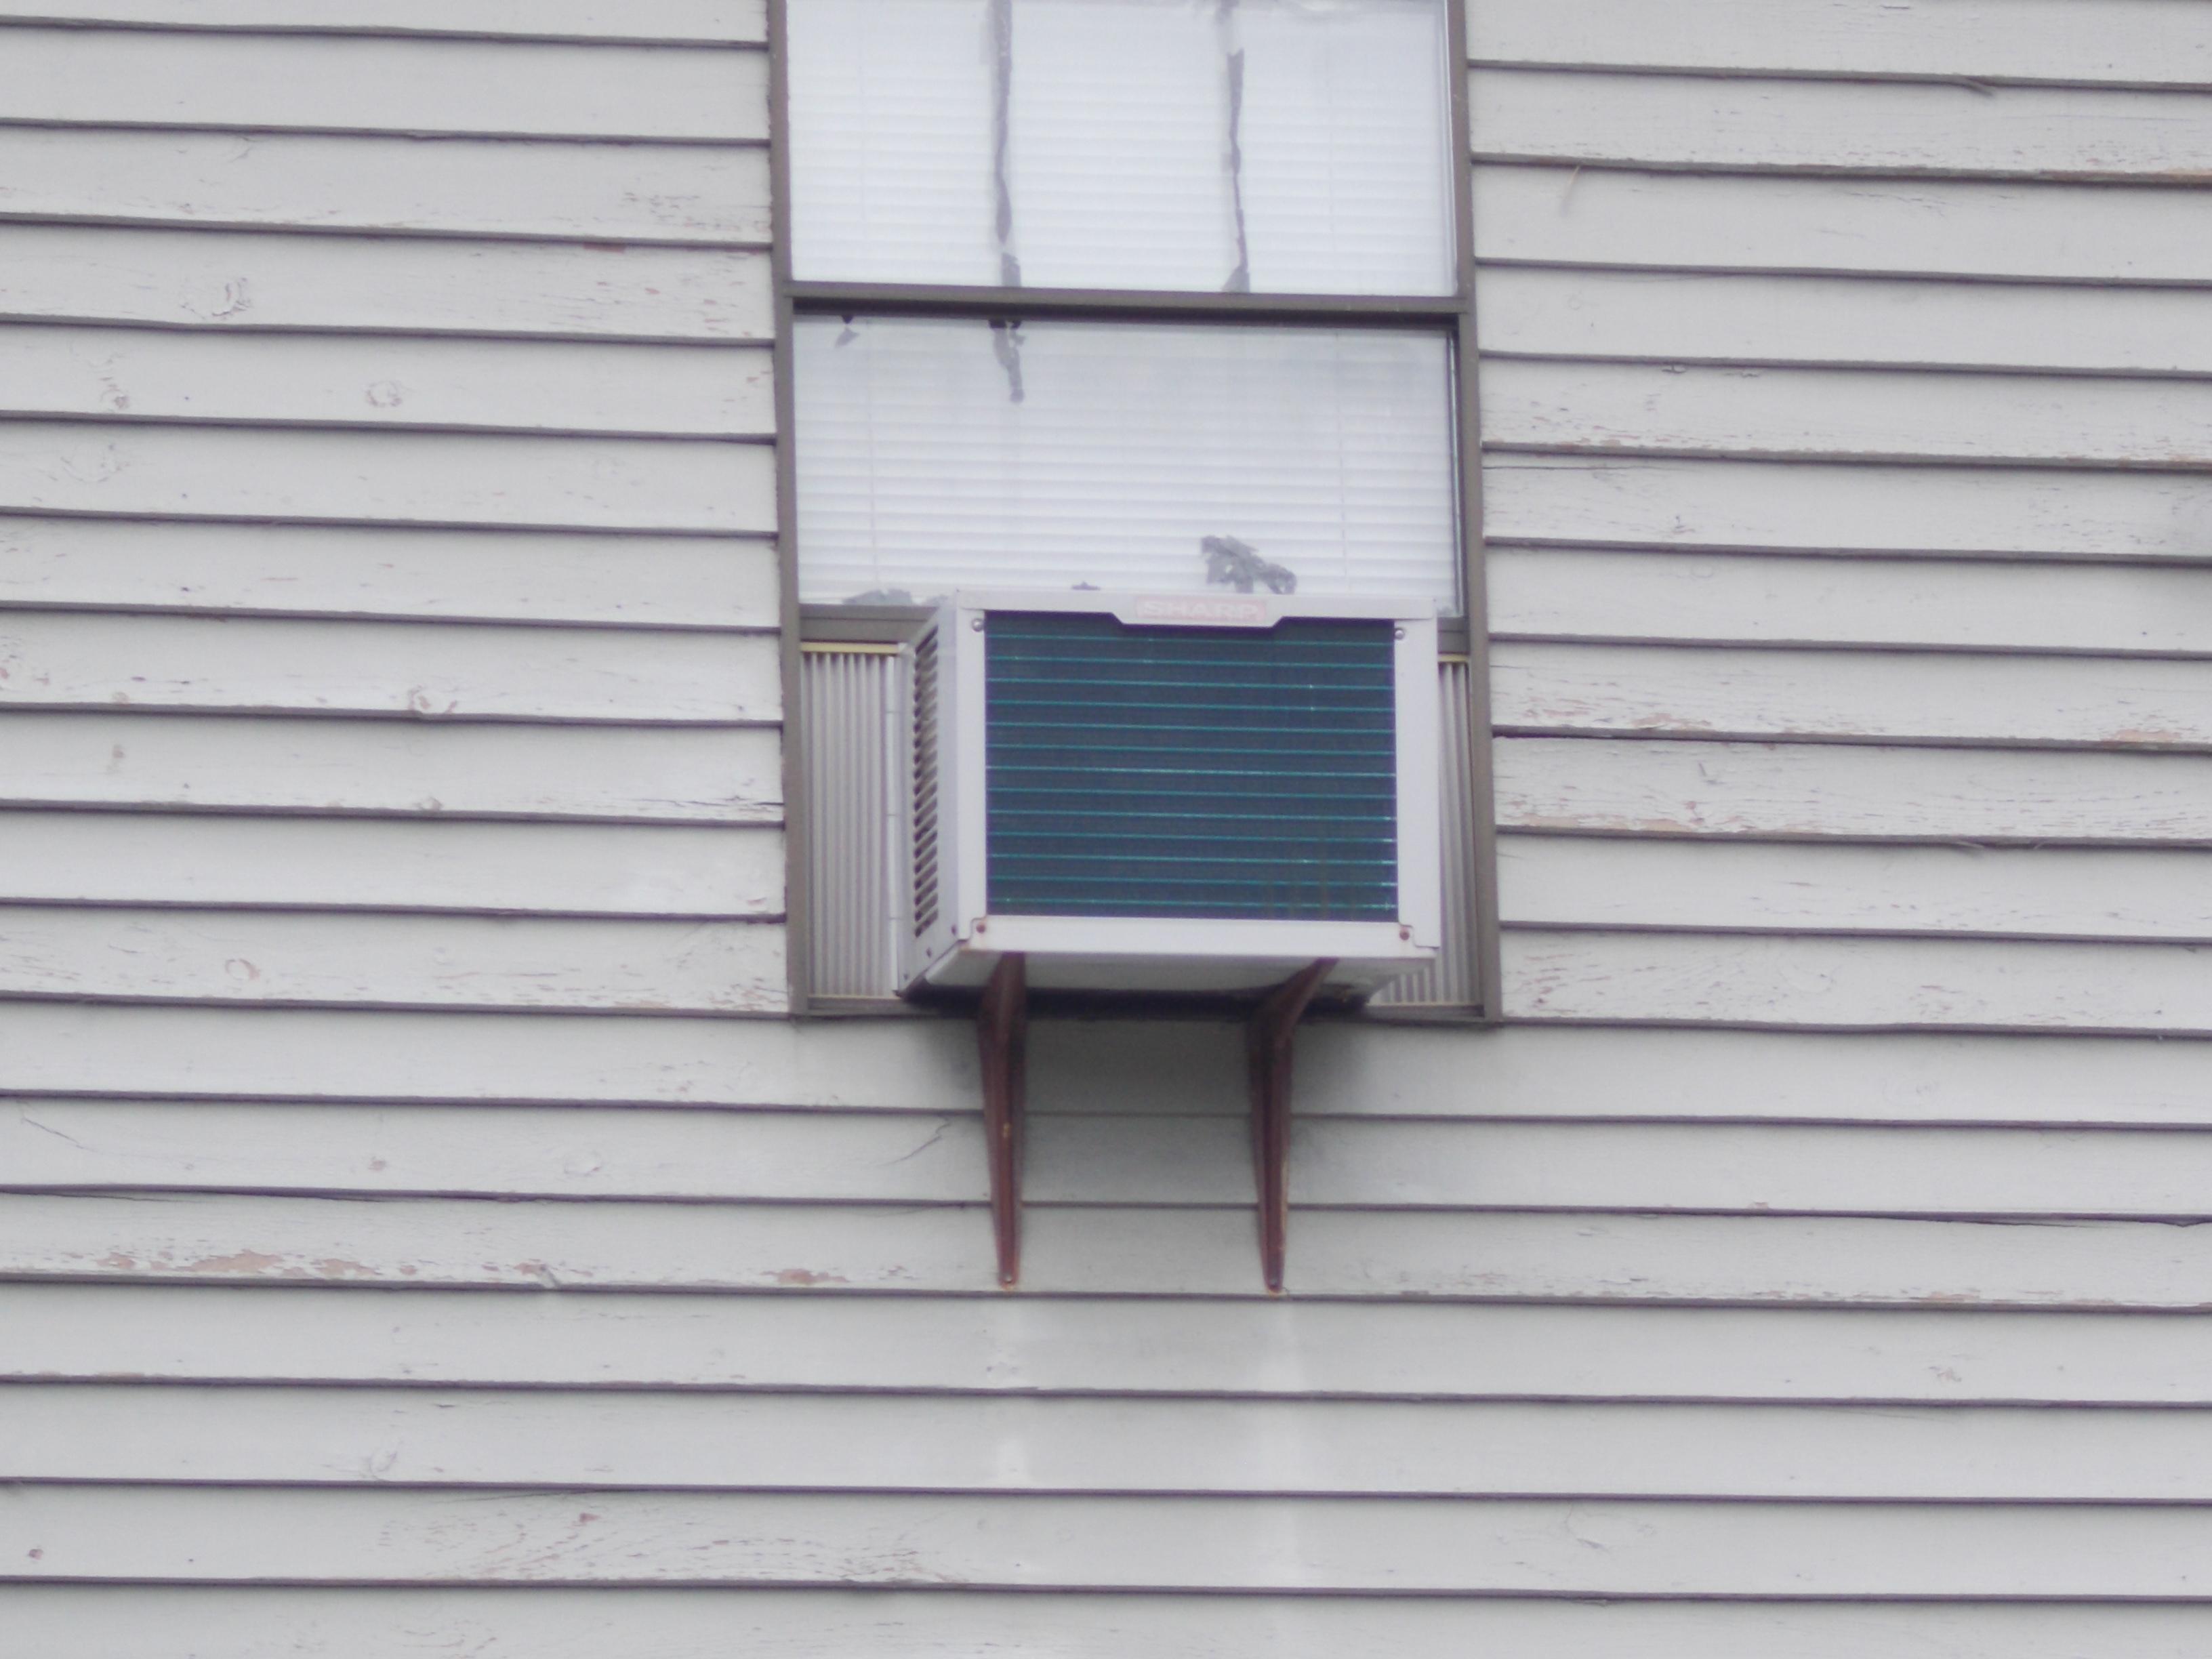 Air conditioner support brackets aspetuck village for Air conditioner bracket law